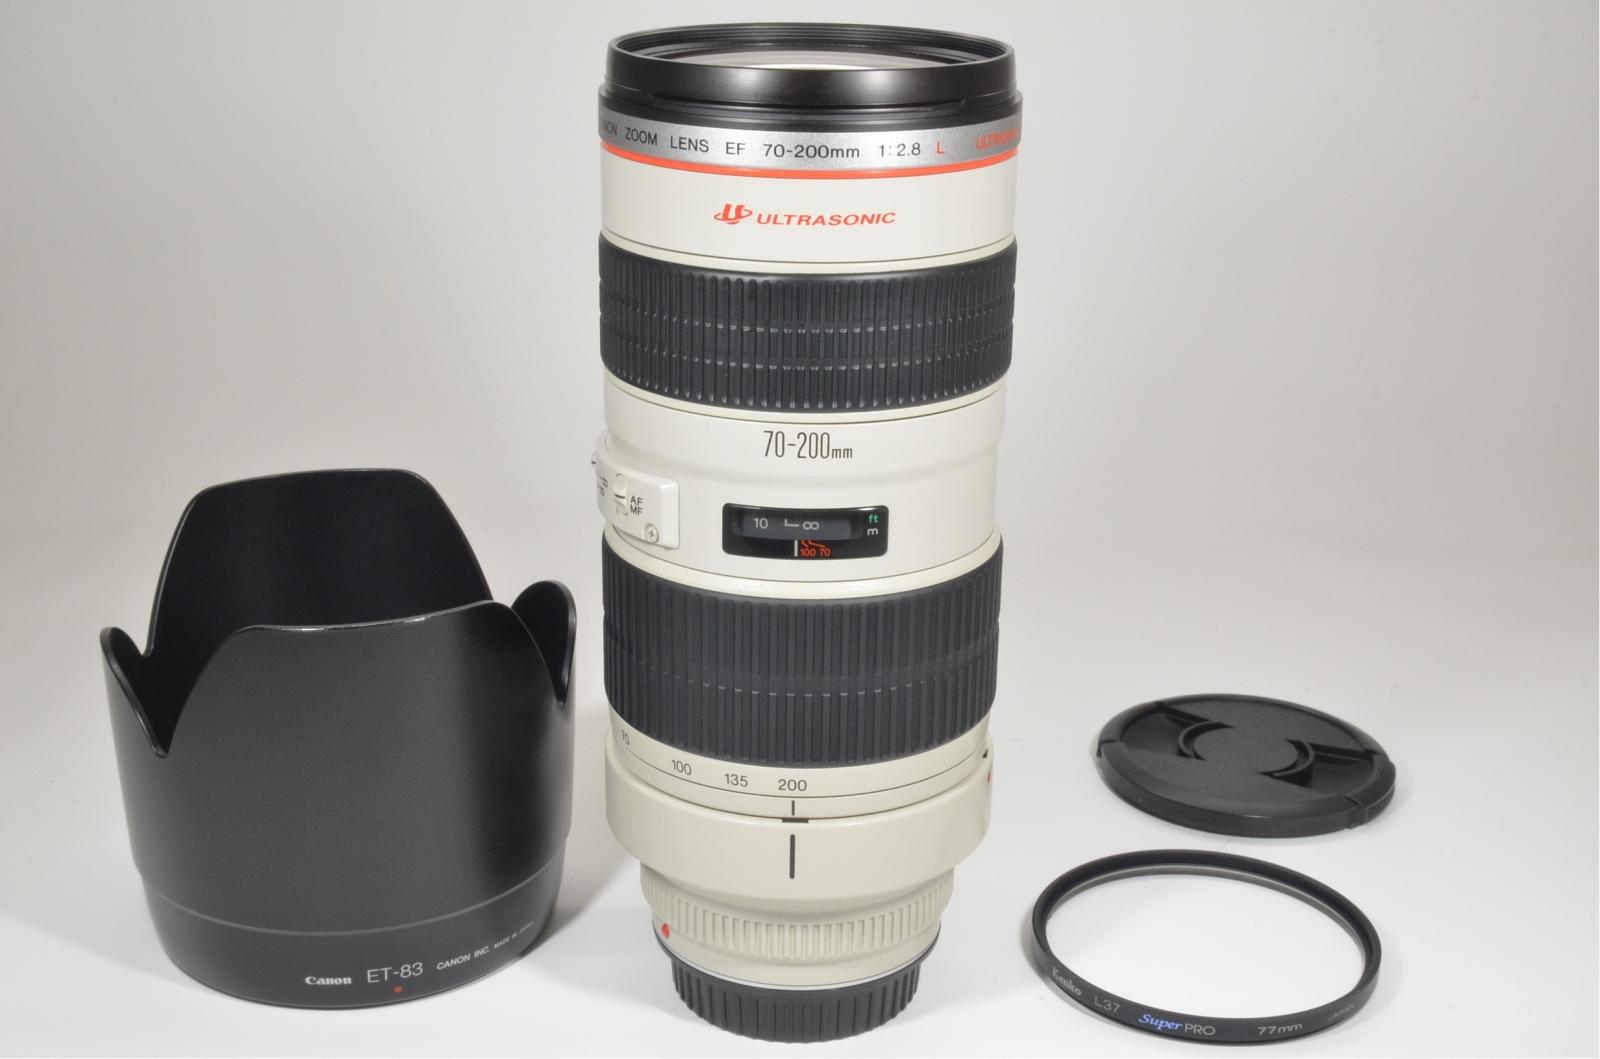 canon ef 70-200mm f/2.8 l usm ultrasonic lens from japan